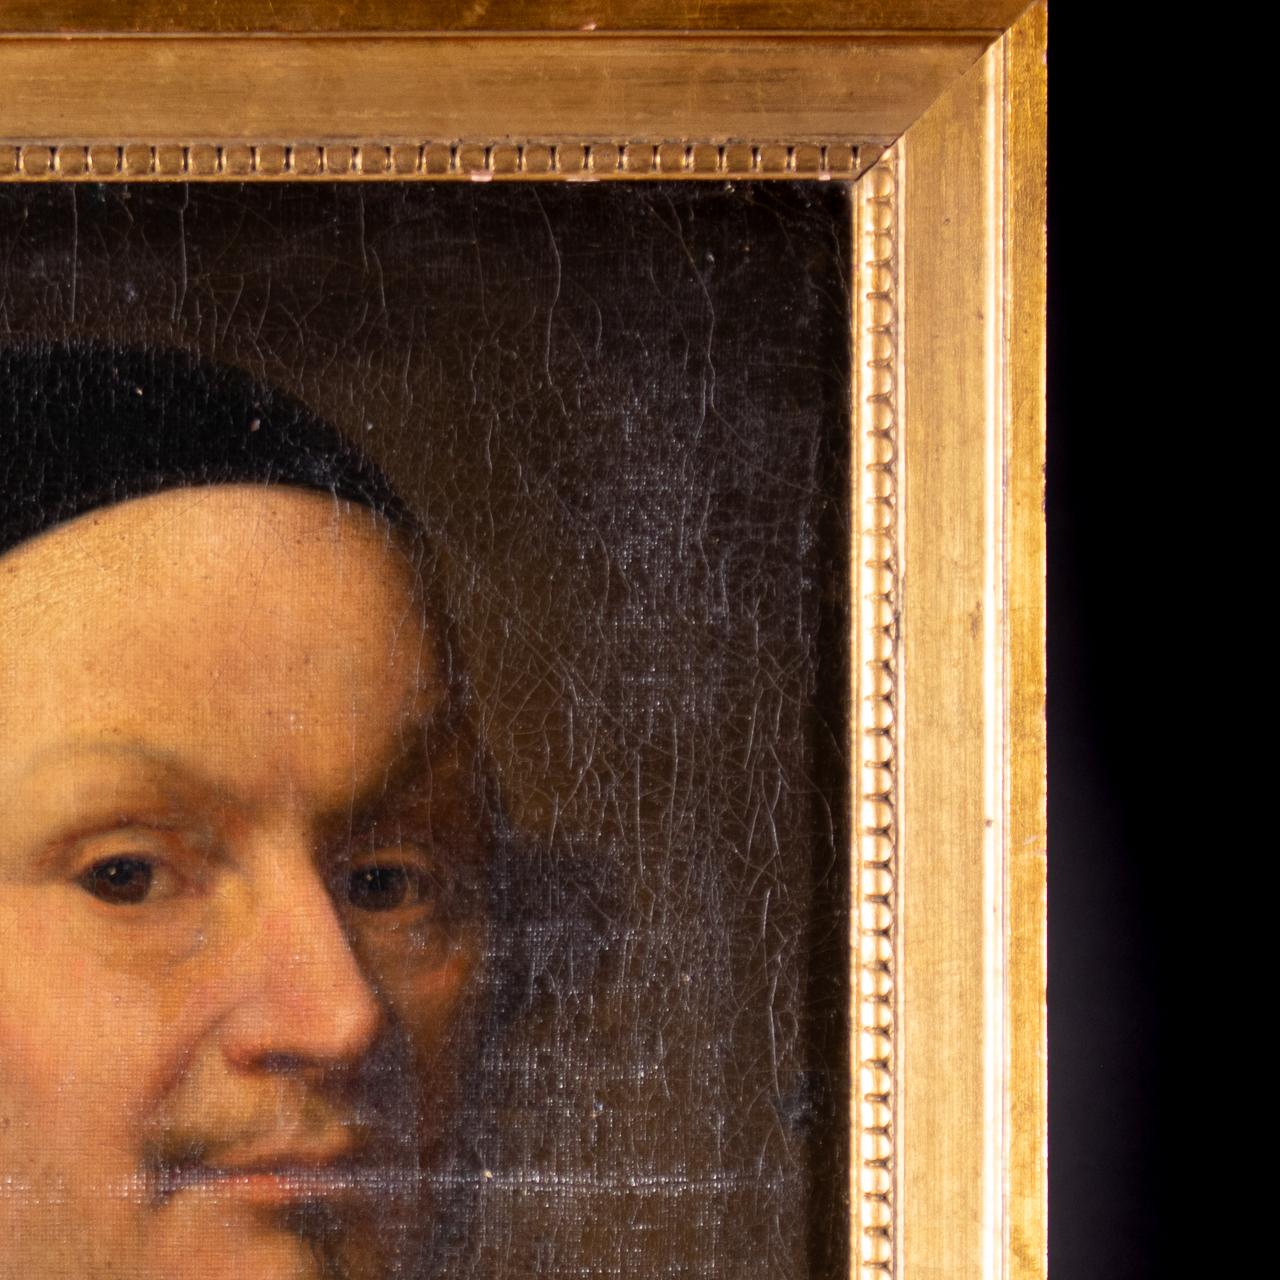 XVII Old Master Portrait - Cardinal - Image 9 of 12